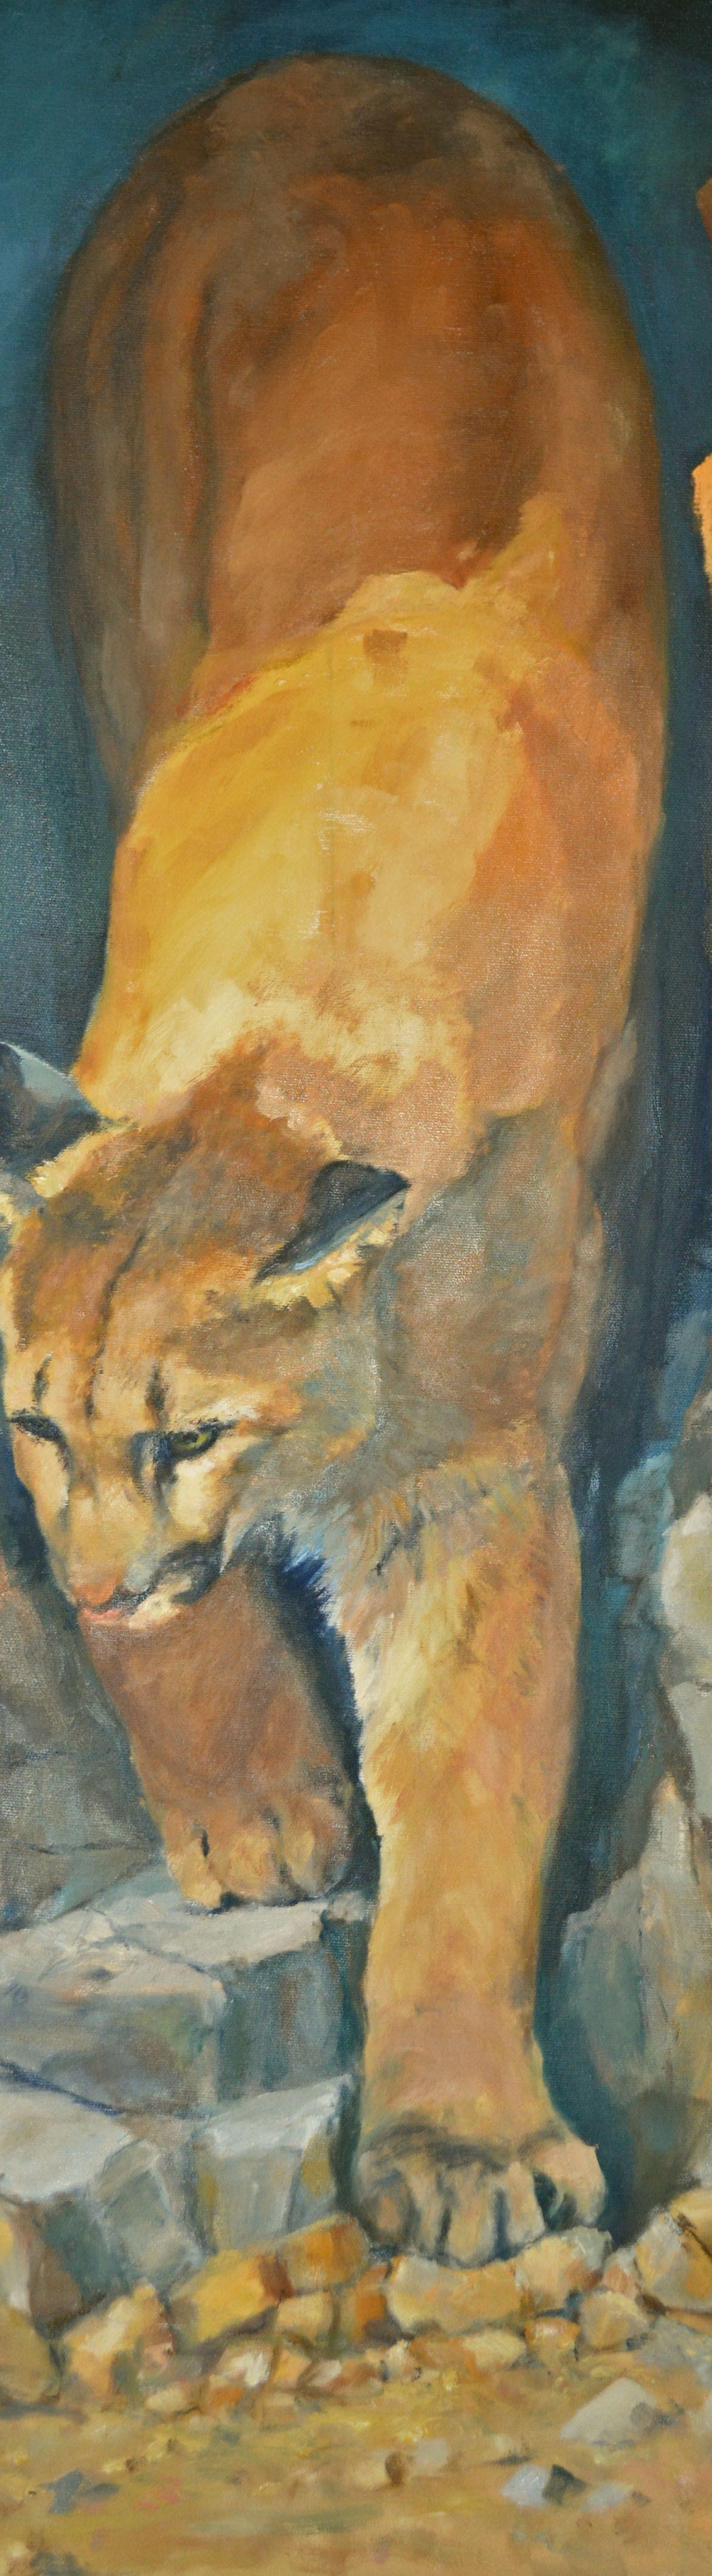 Mountain Cat, Jim Hollon, Painting, Rogoway Gallery